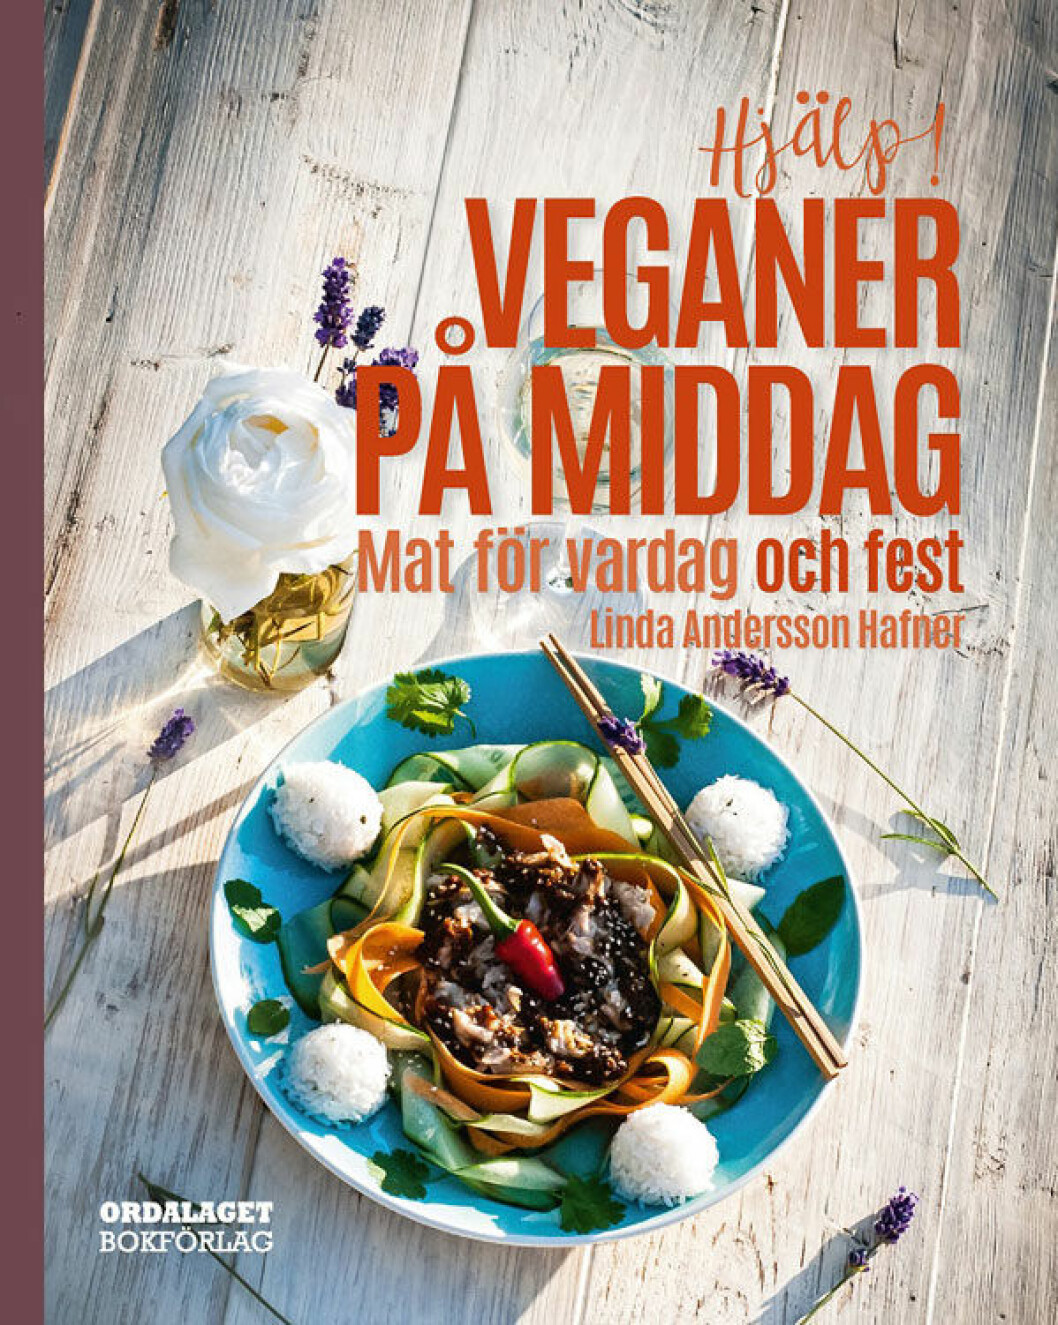 Hjälp! Veganer på middag av Linda Andersson Hafner